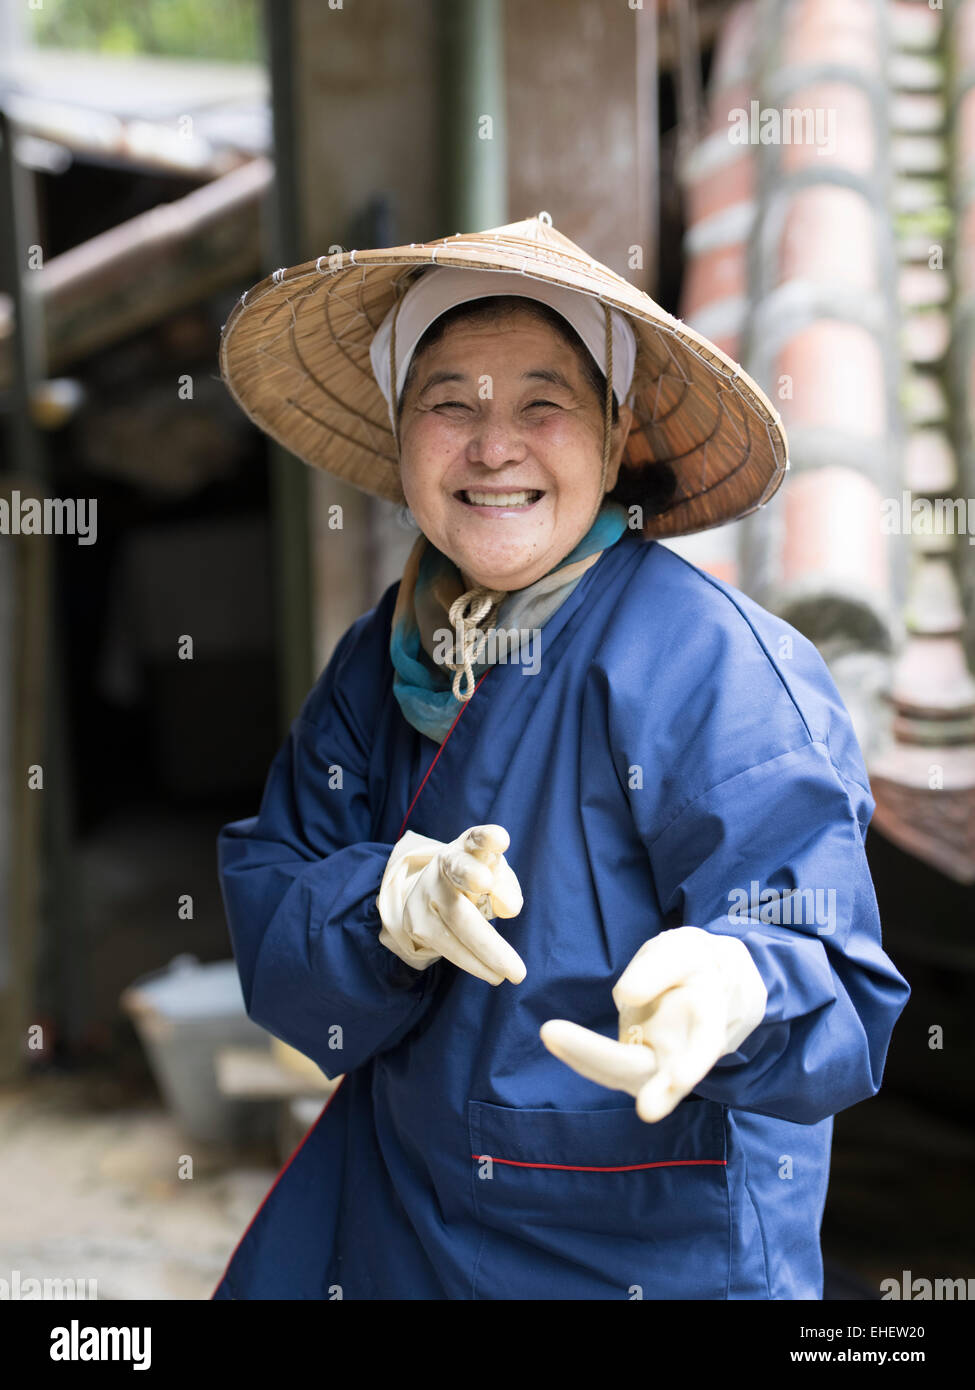 Elderly Okinawan woman / farmer wearing traditional conical hat, Yomitan, Okinawa - Stock Image